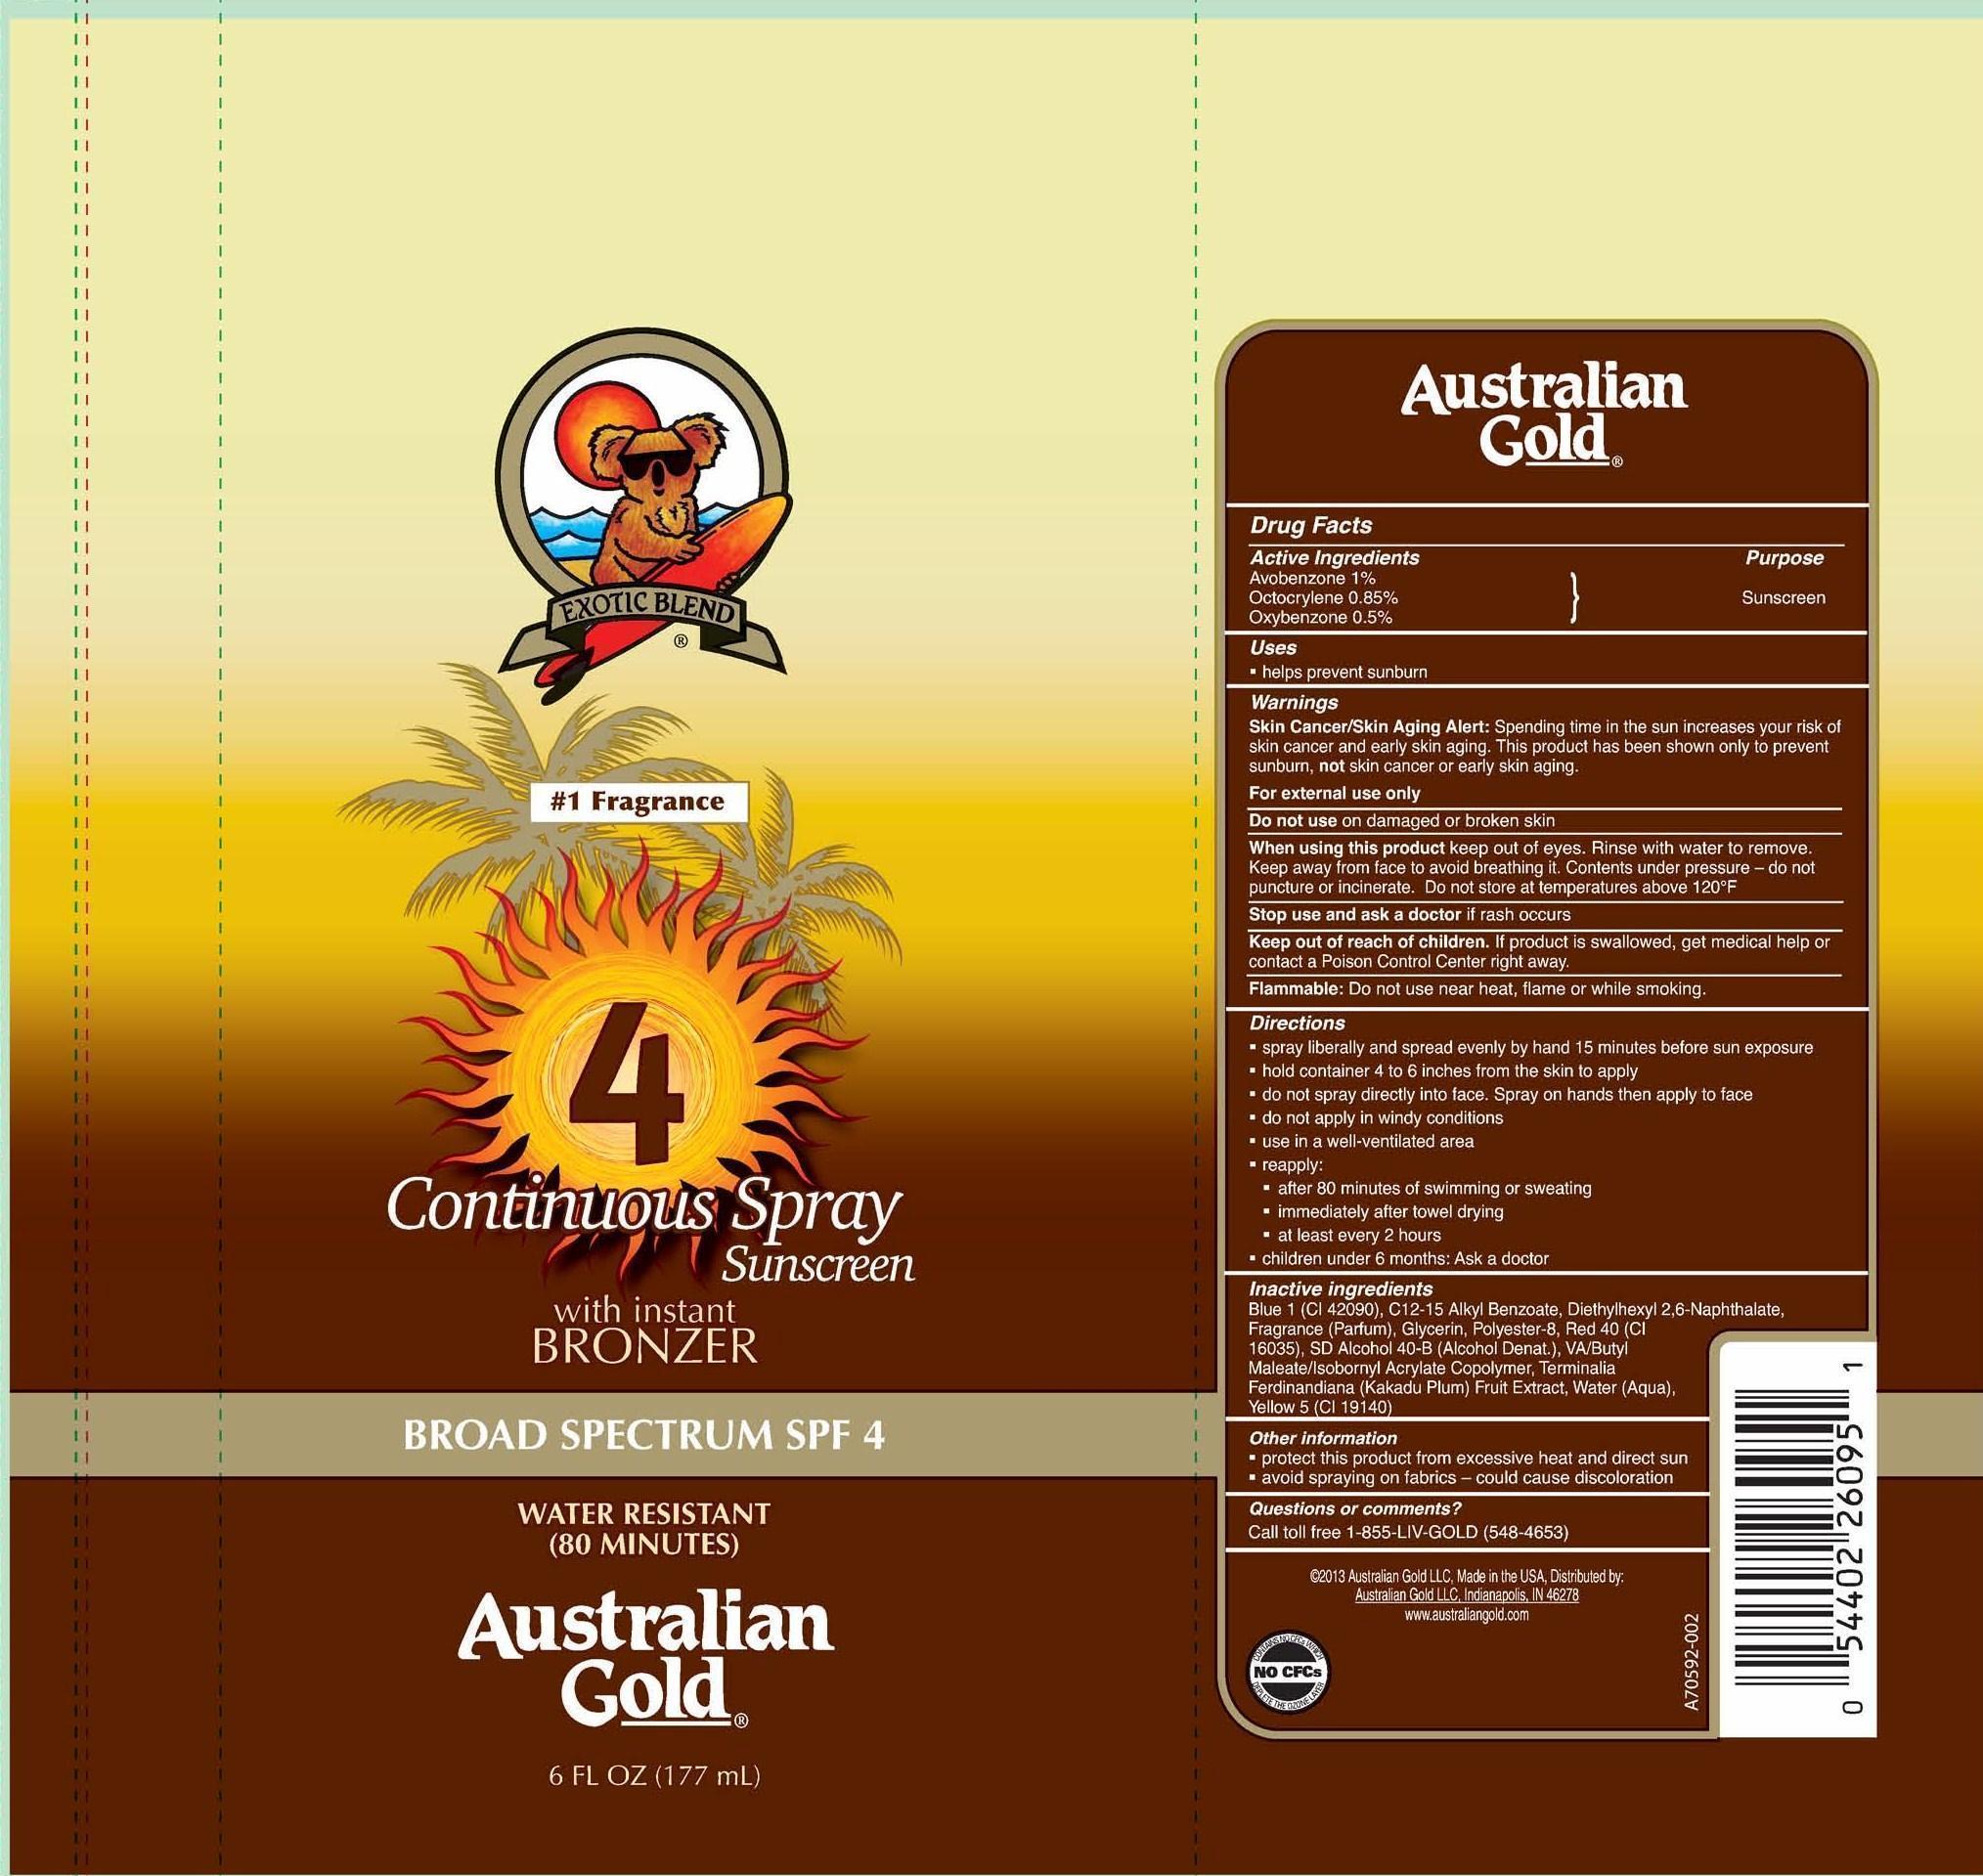 Australian Gold Broad Spectrum Spf 4 (Avobenzone, Octocrylene And Oxybenzone) Spray [Prime Packaging, Inc.]